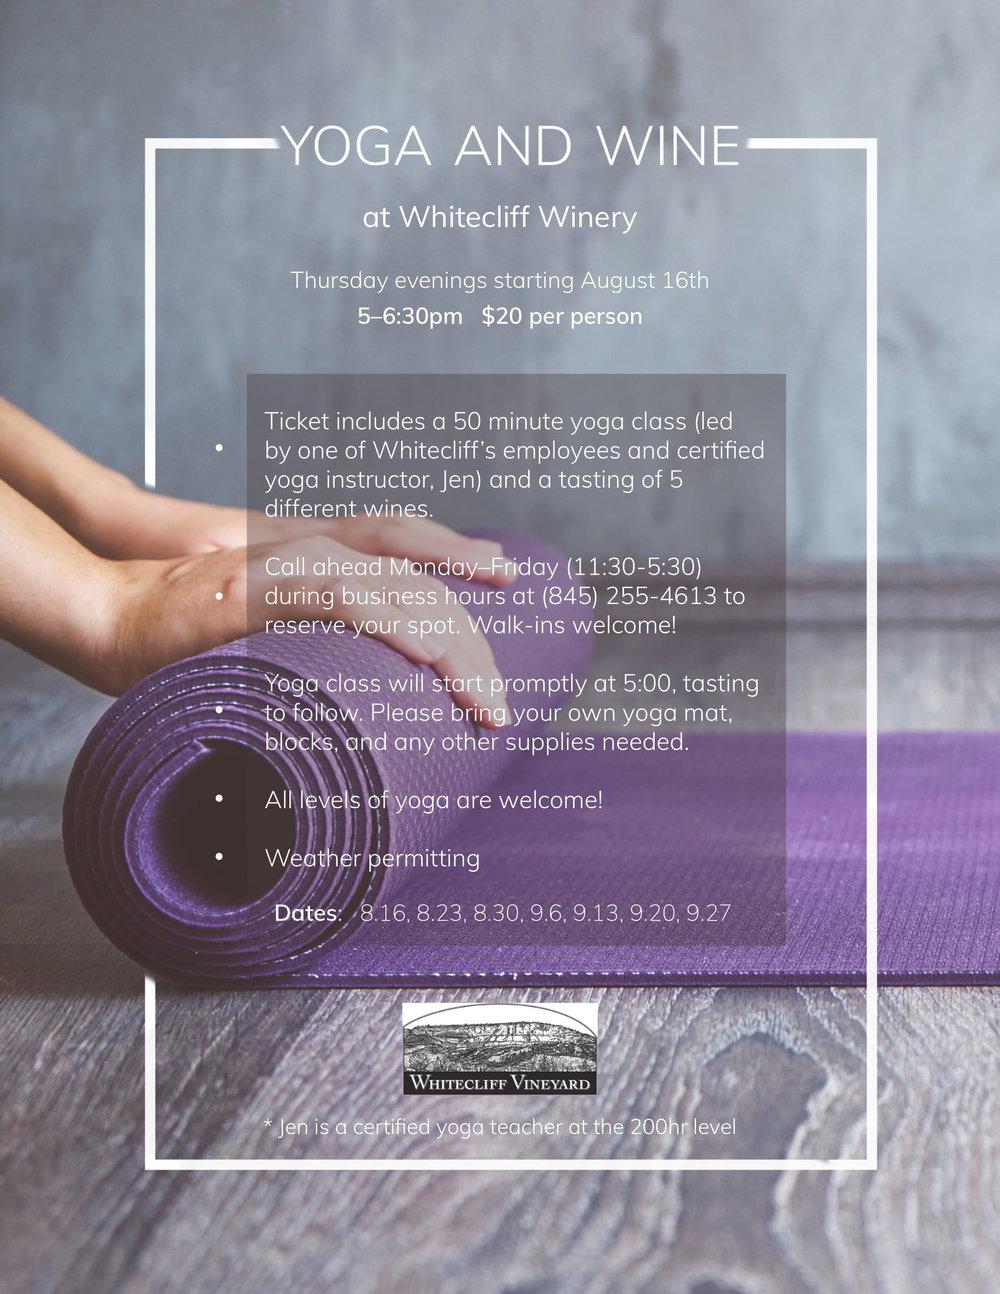 wine and yoga flyer-1.jpg